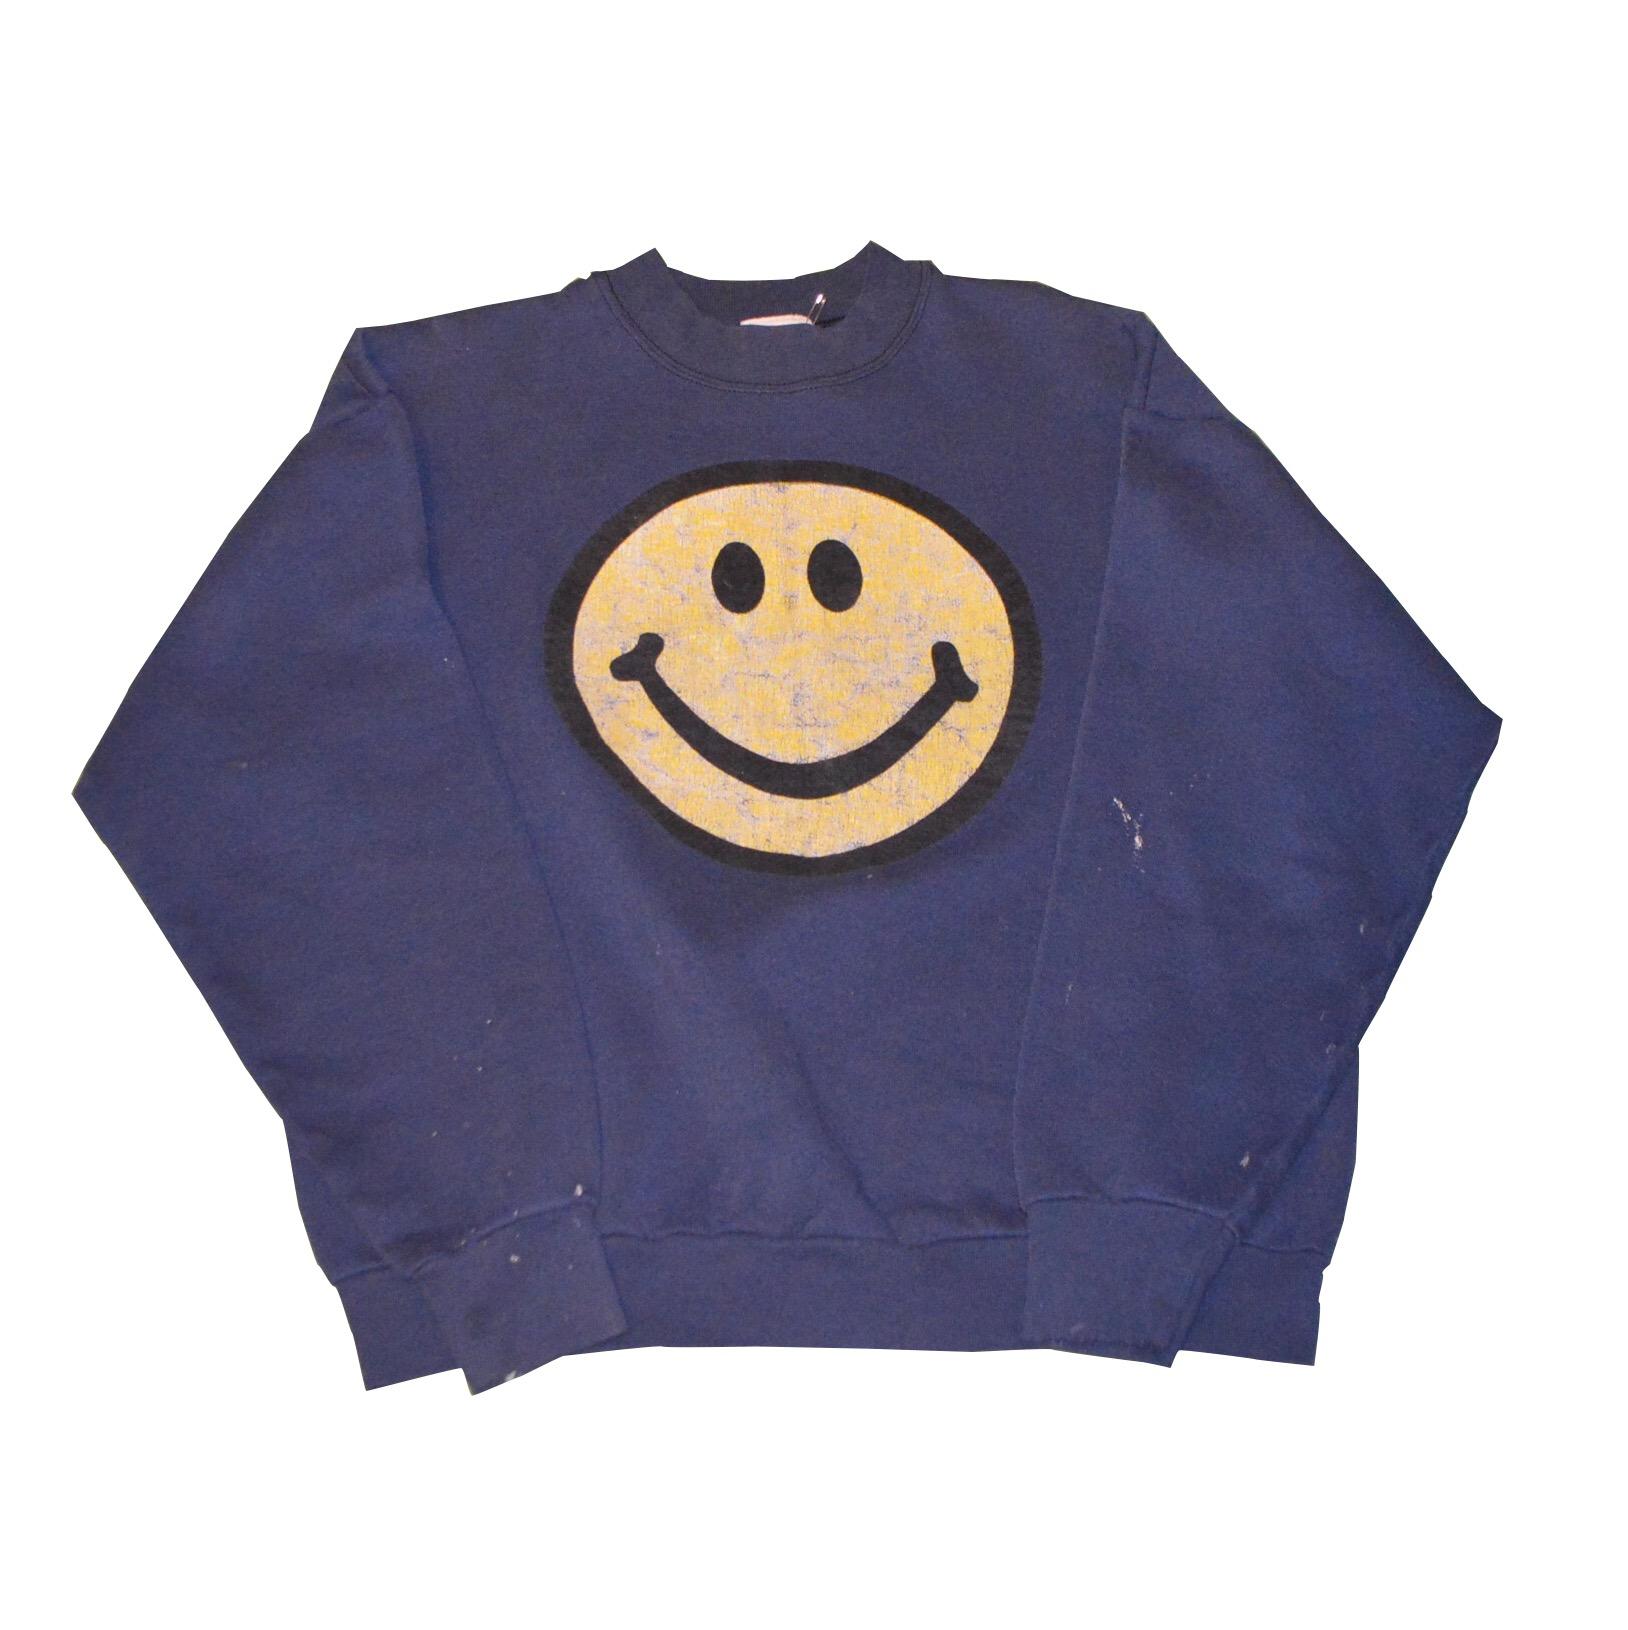 JUNK!! 80S USA製 Smiley face スウェット!! メンズ レディース